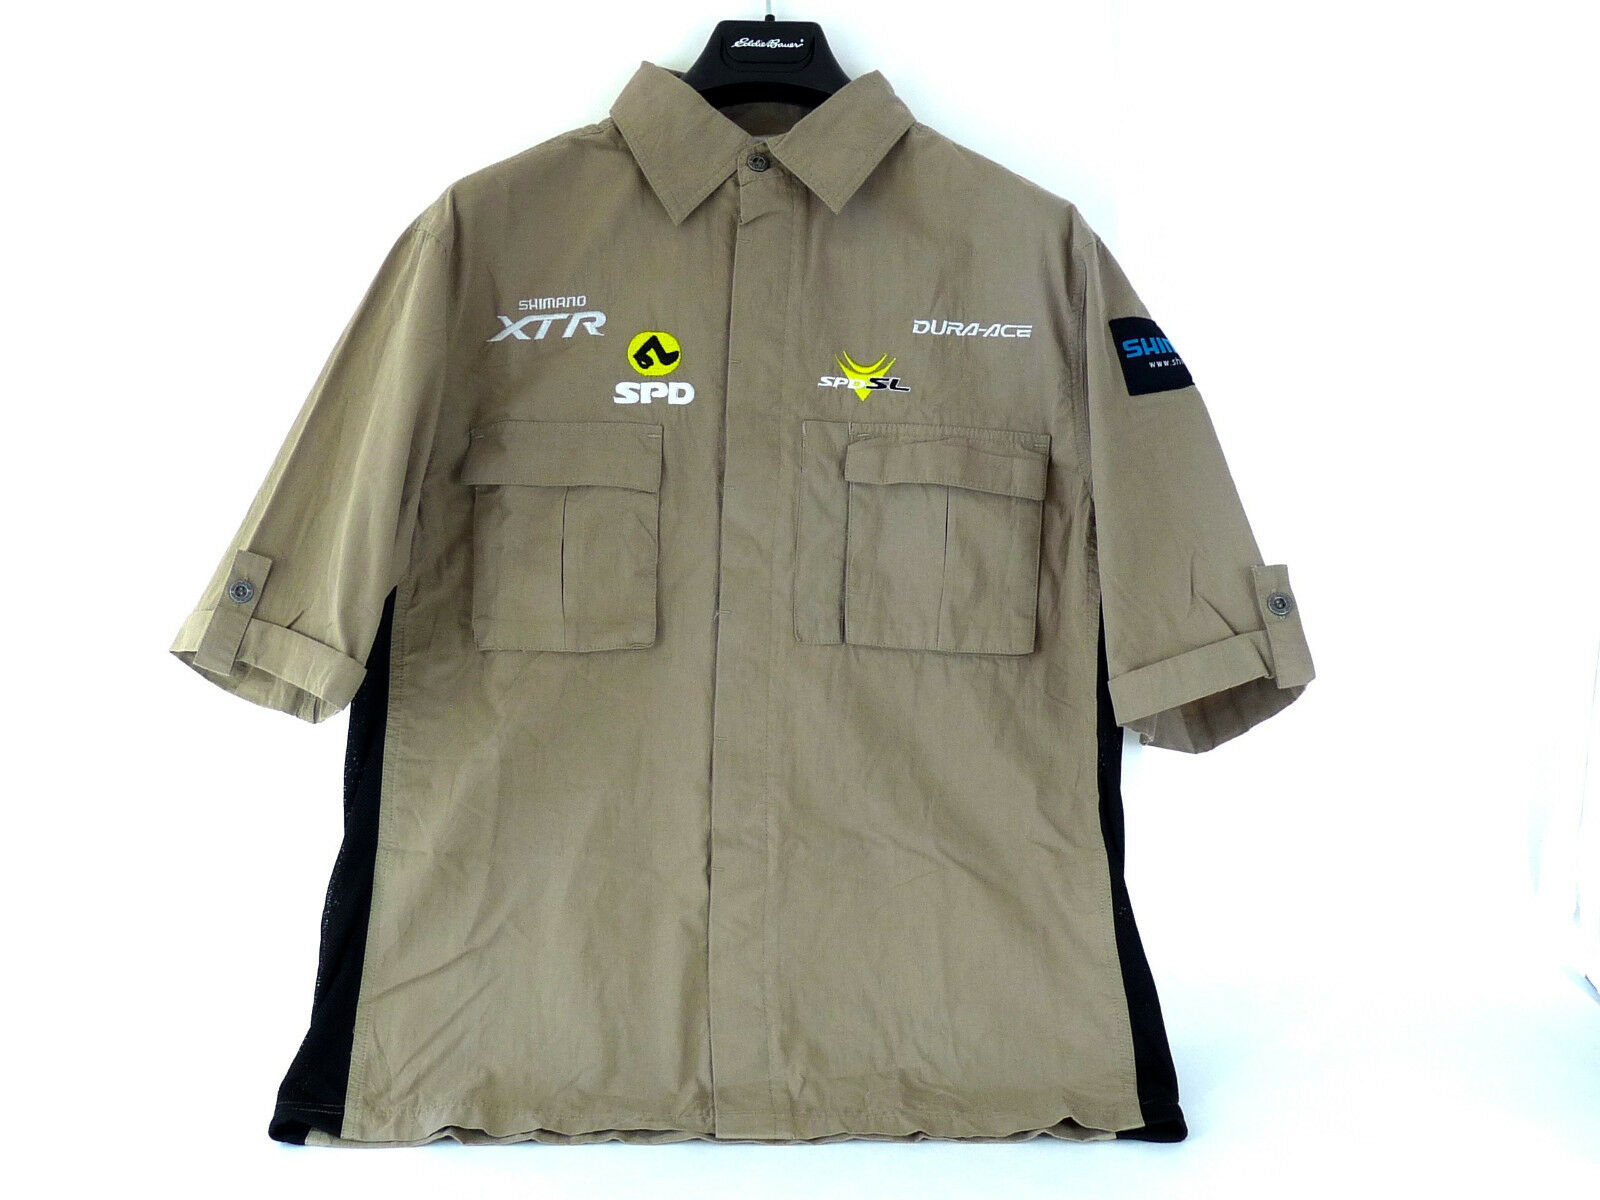 Shimano Mechanics shirt XTR Dura Ace Beige Size XXL 2XL NOS